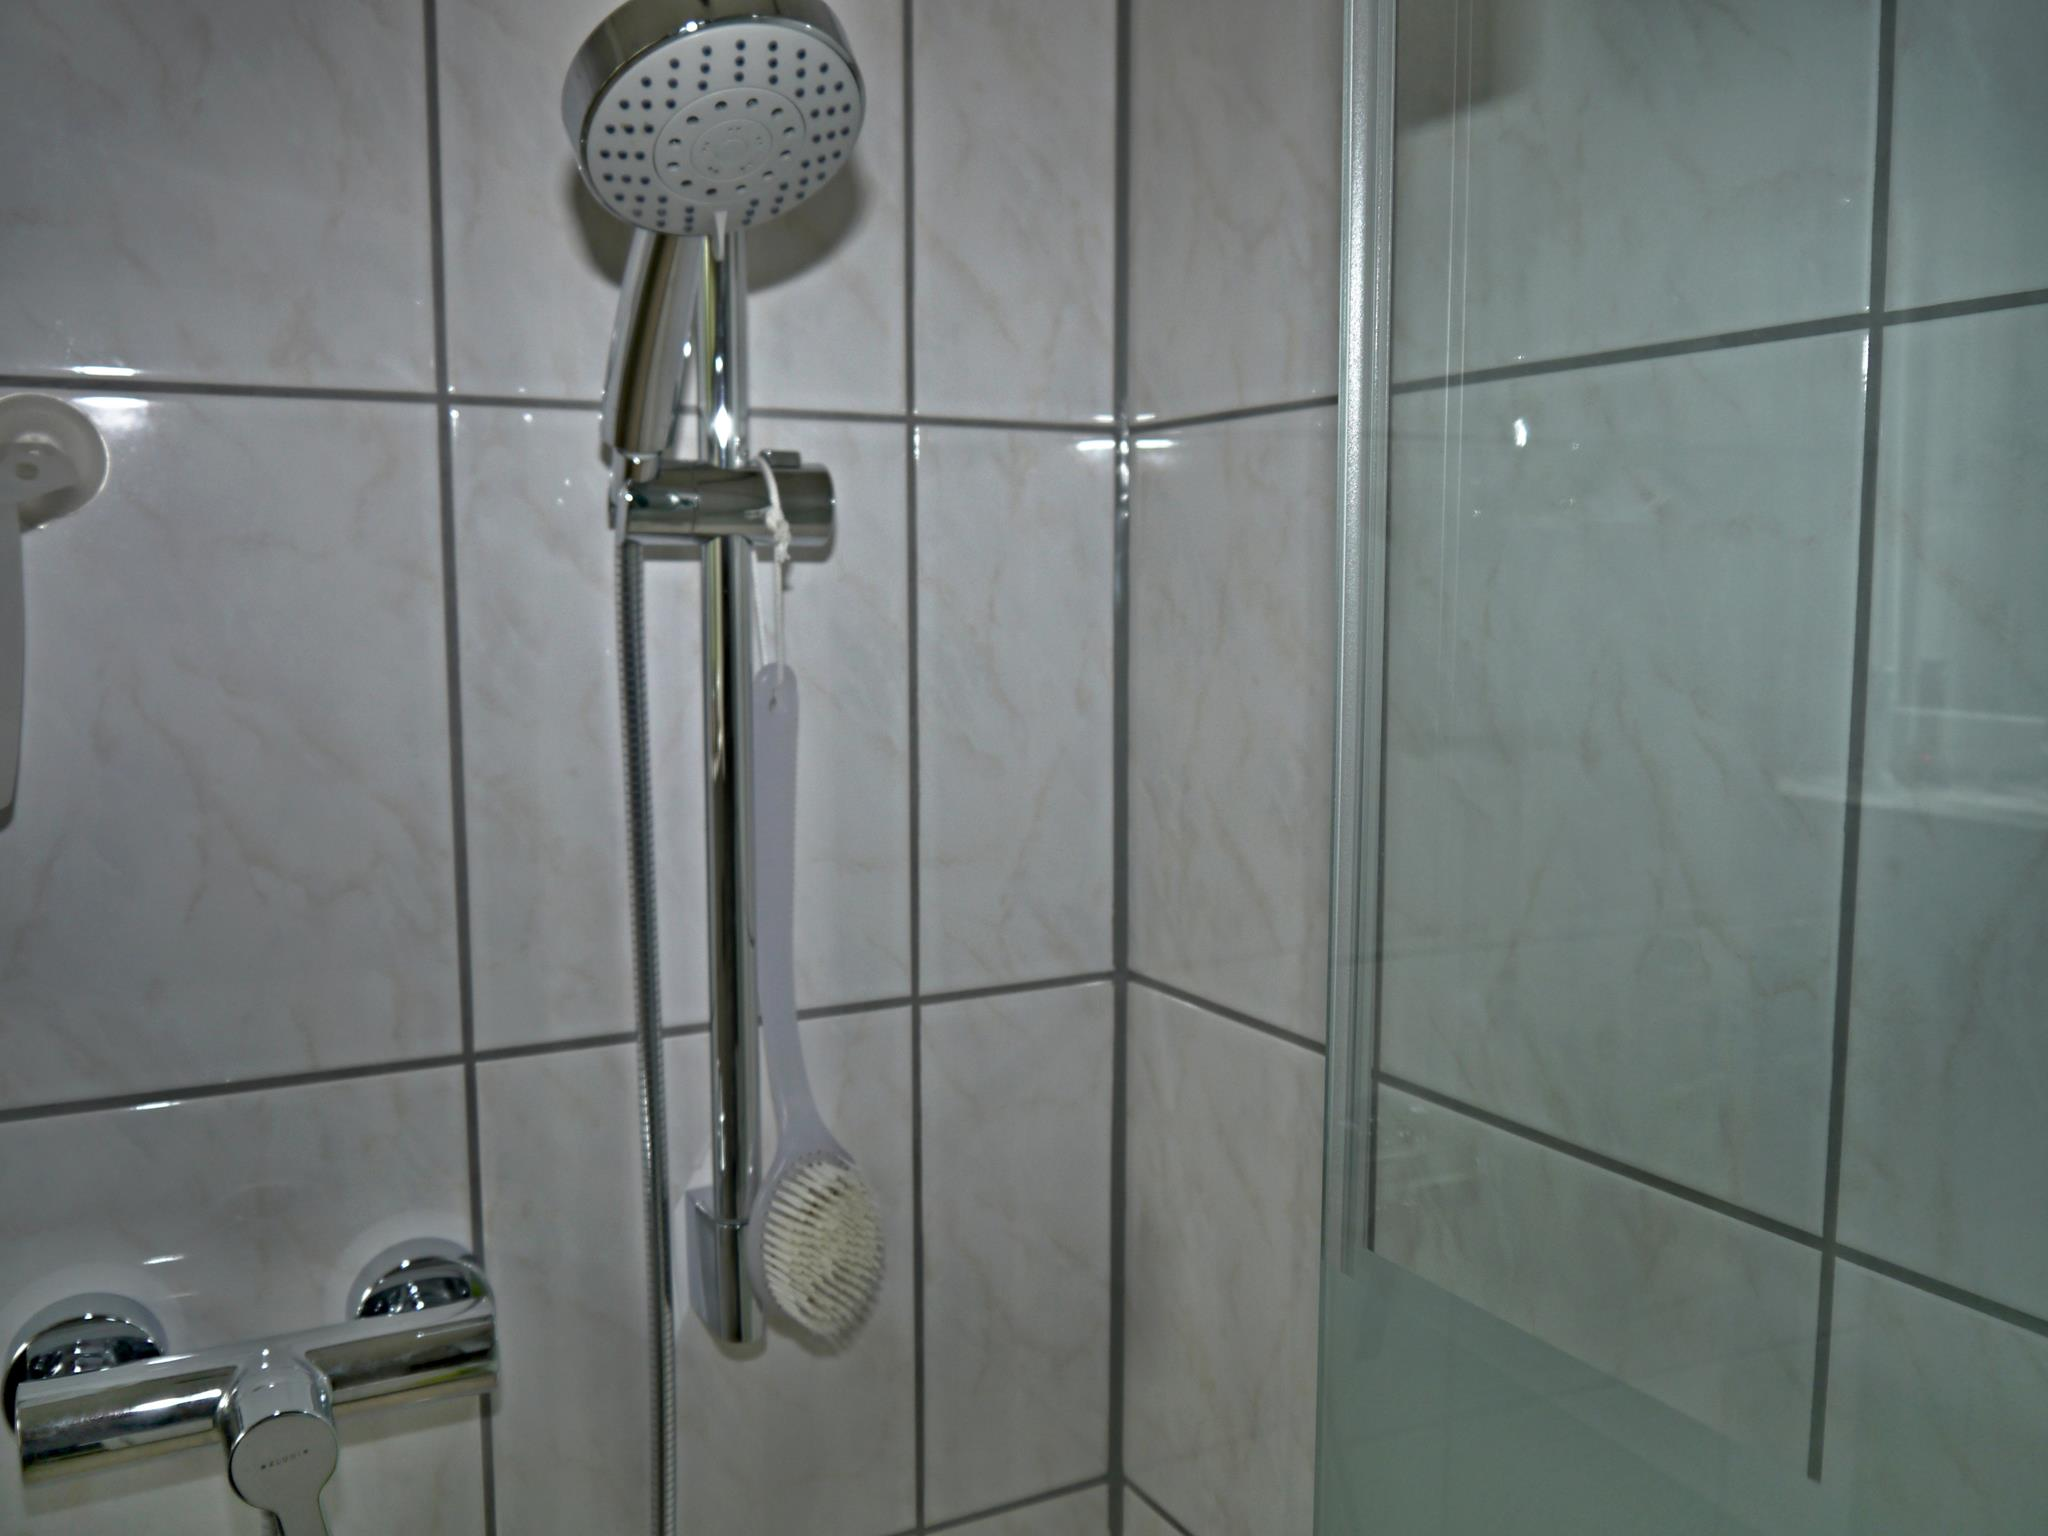 bildergalerie, Badezimmer ideen